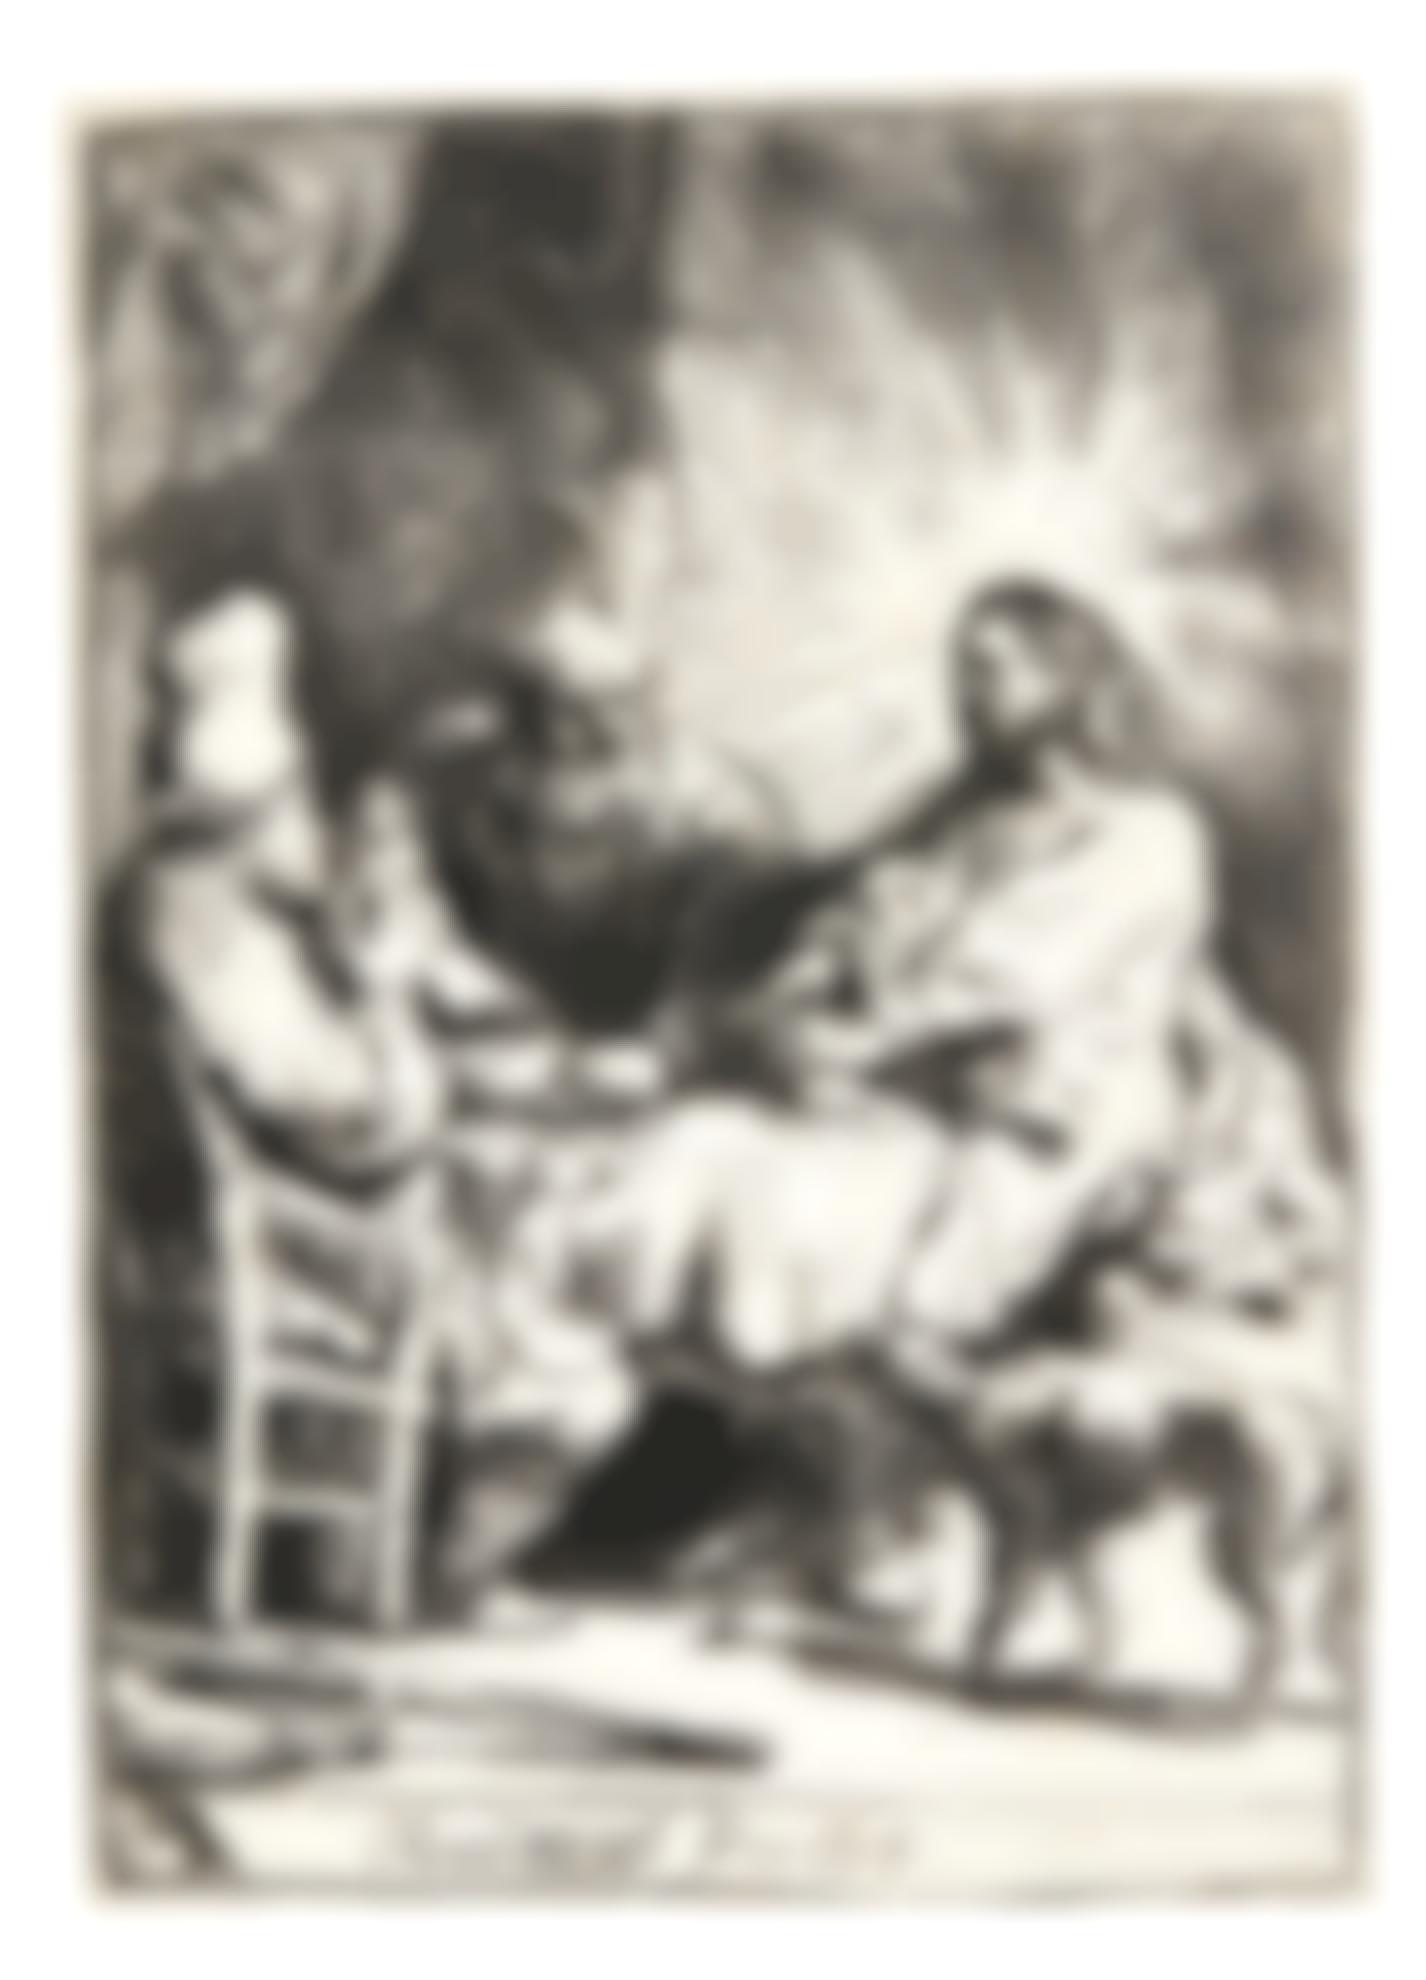 Rembrandt van Rijn-Christ At Emmaus: The Smaller Plate (B., Holl. 88; New Holl. 129; H. 121)-1634